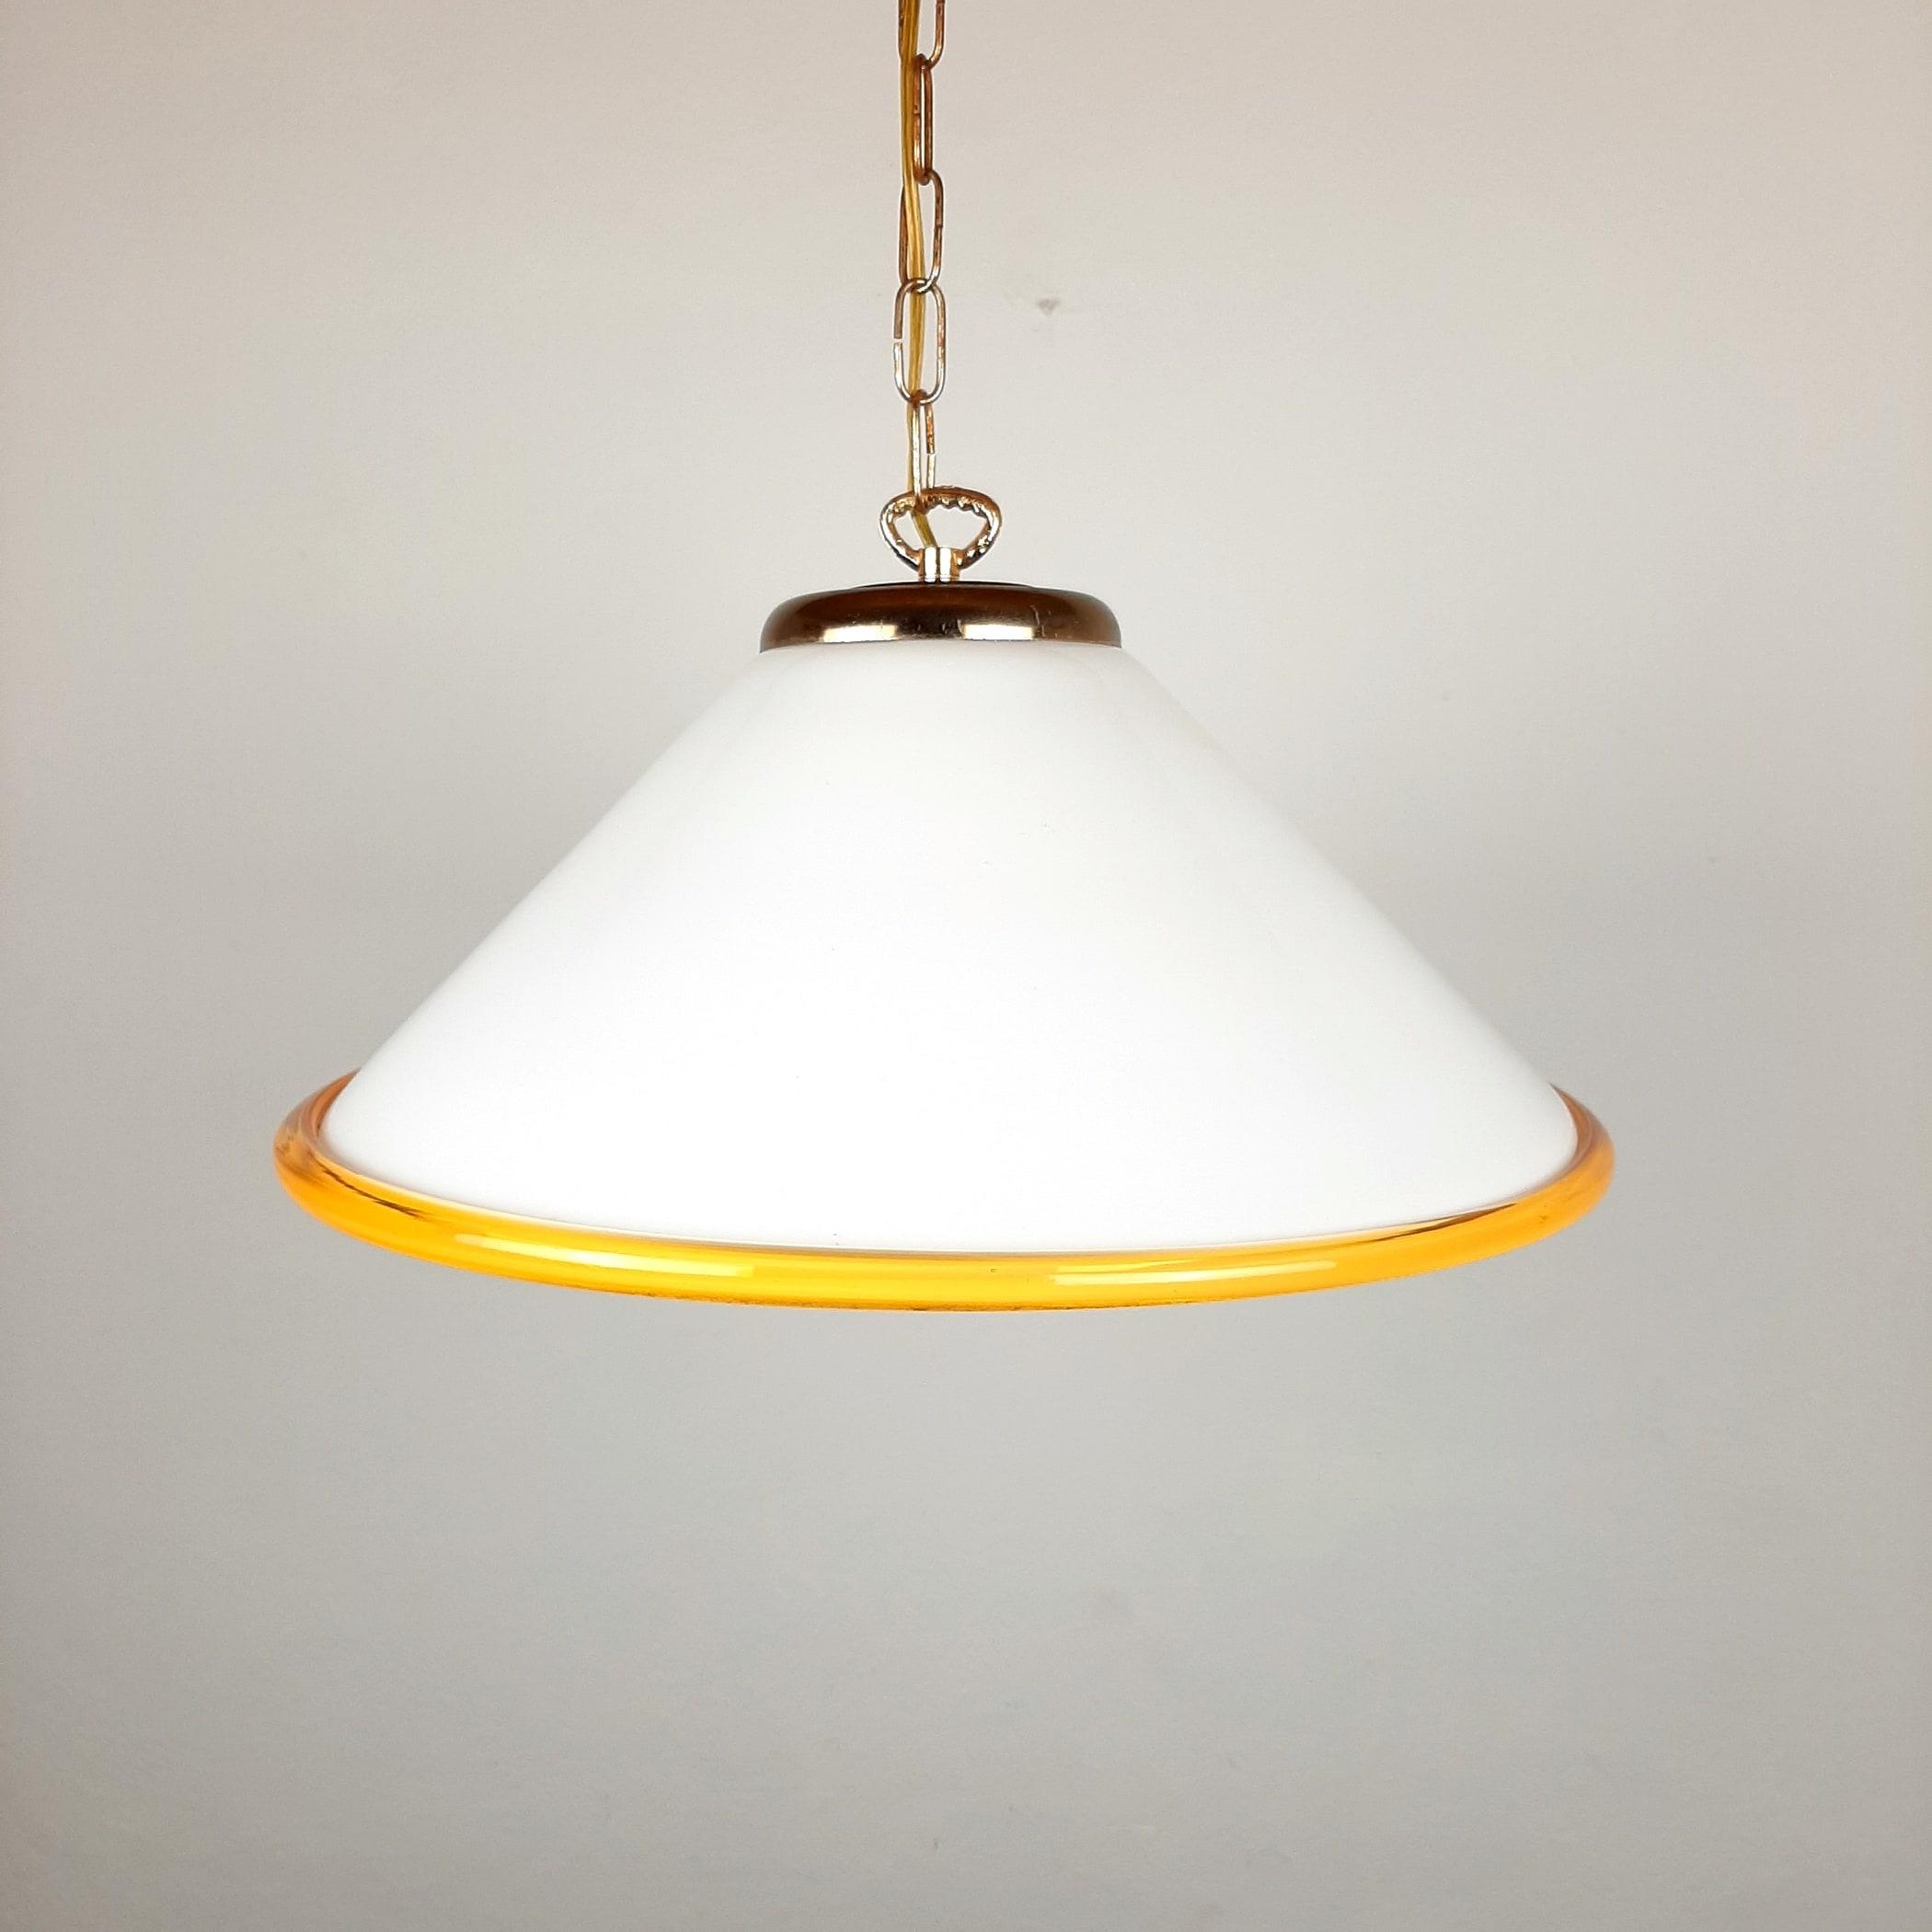 Vintage murano glass pendant lamp Italy 1970s Retro lighting Space age